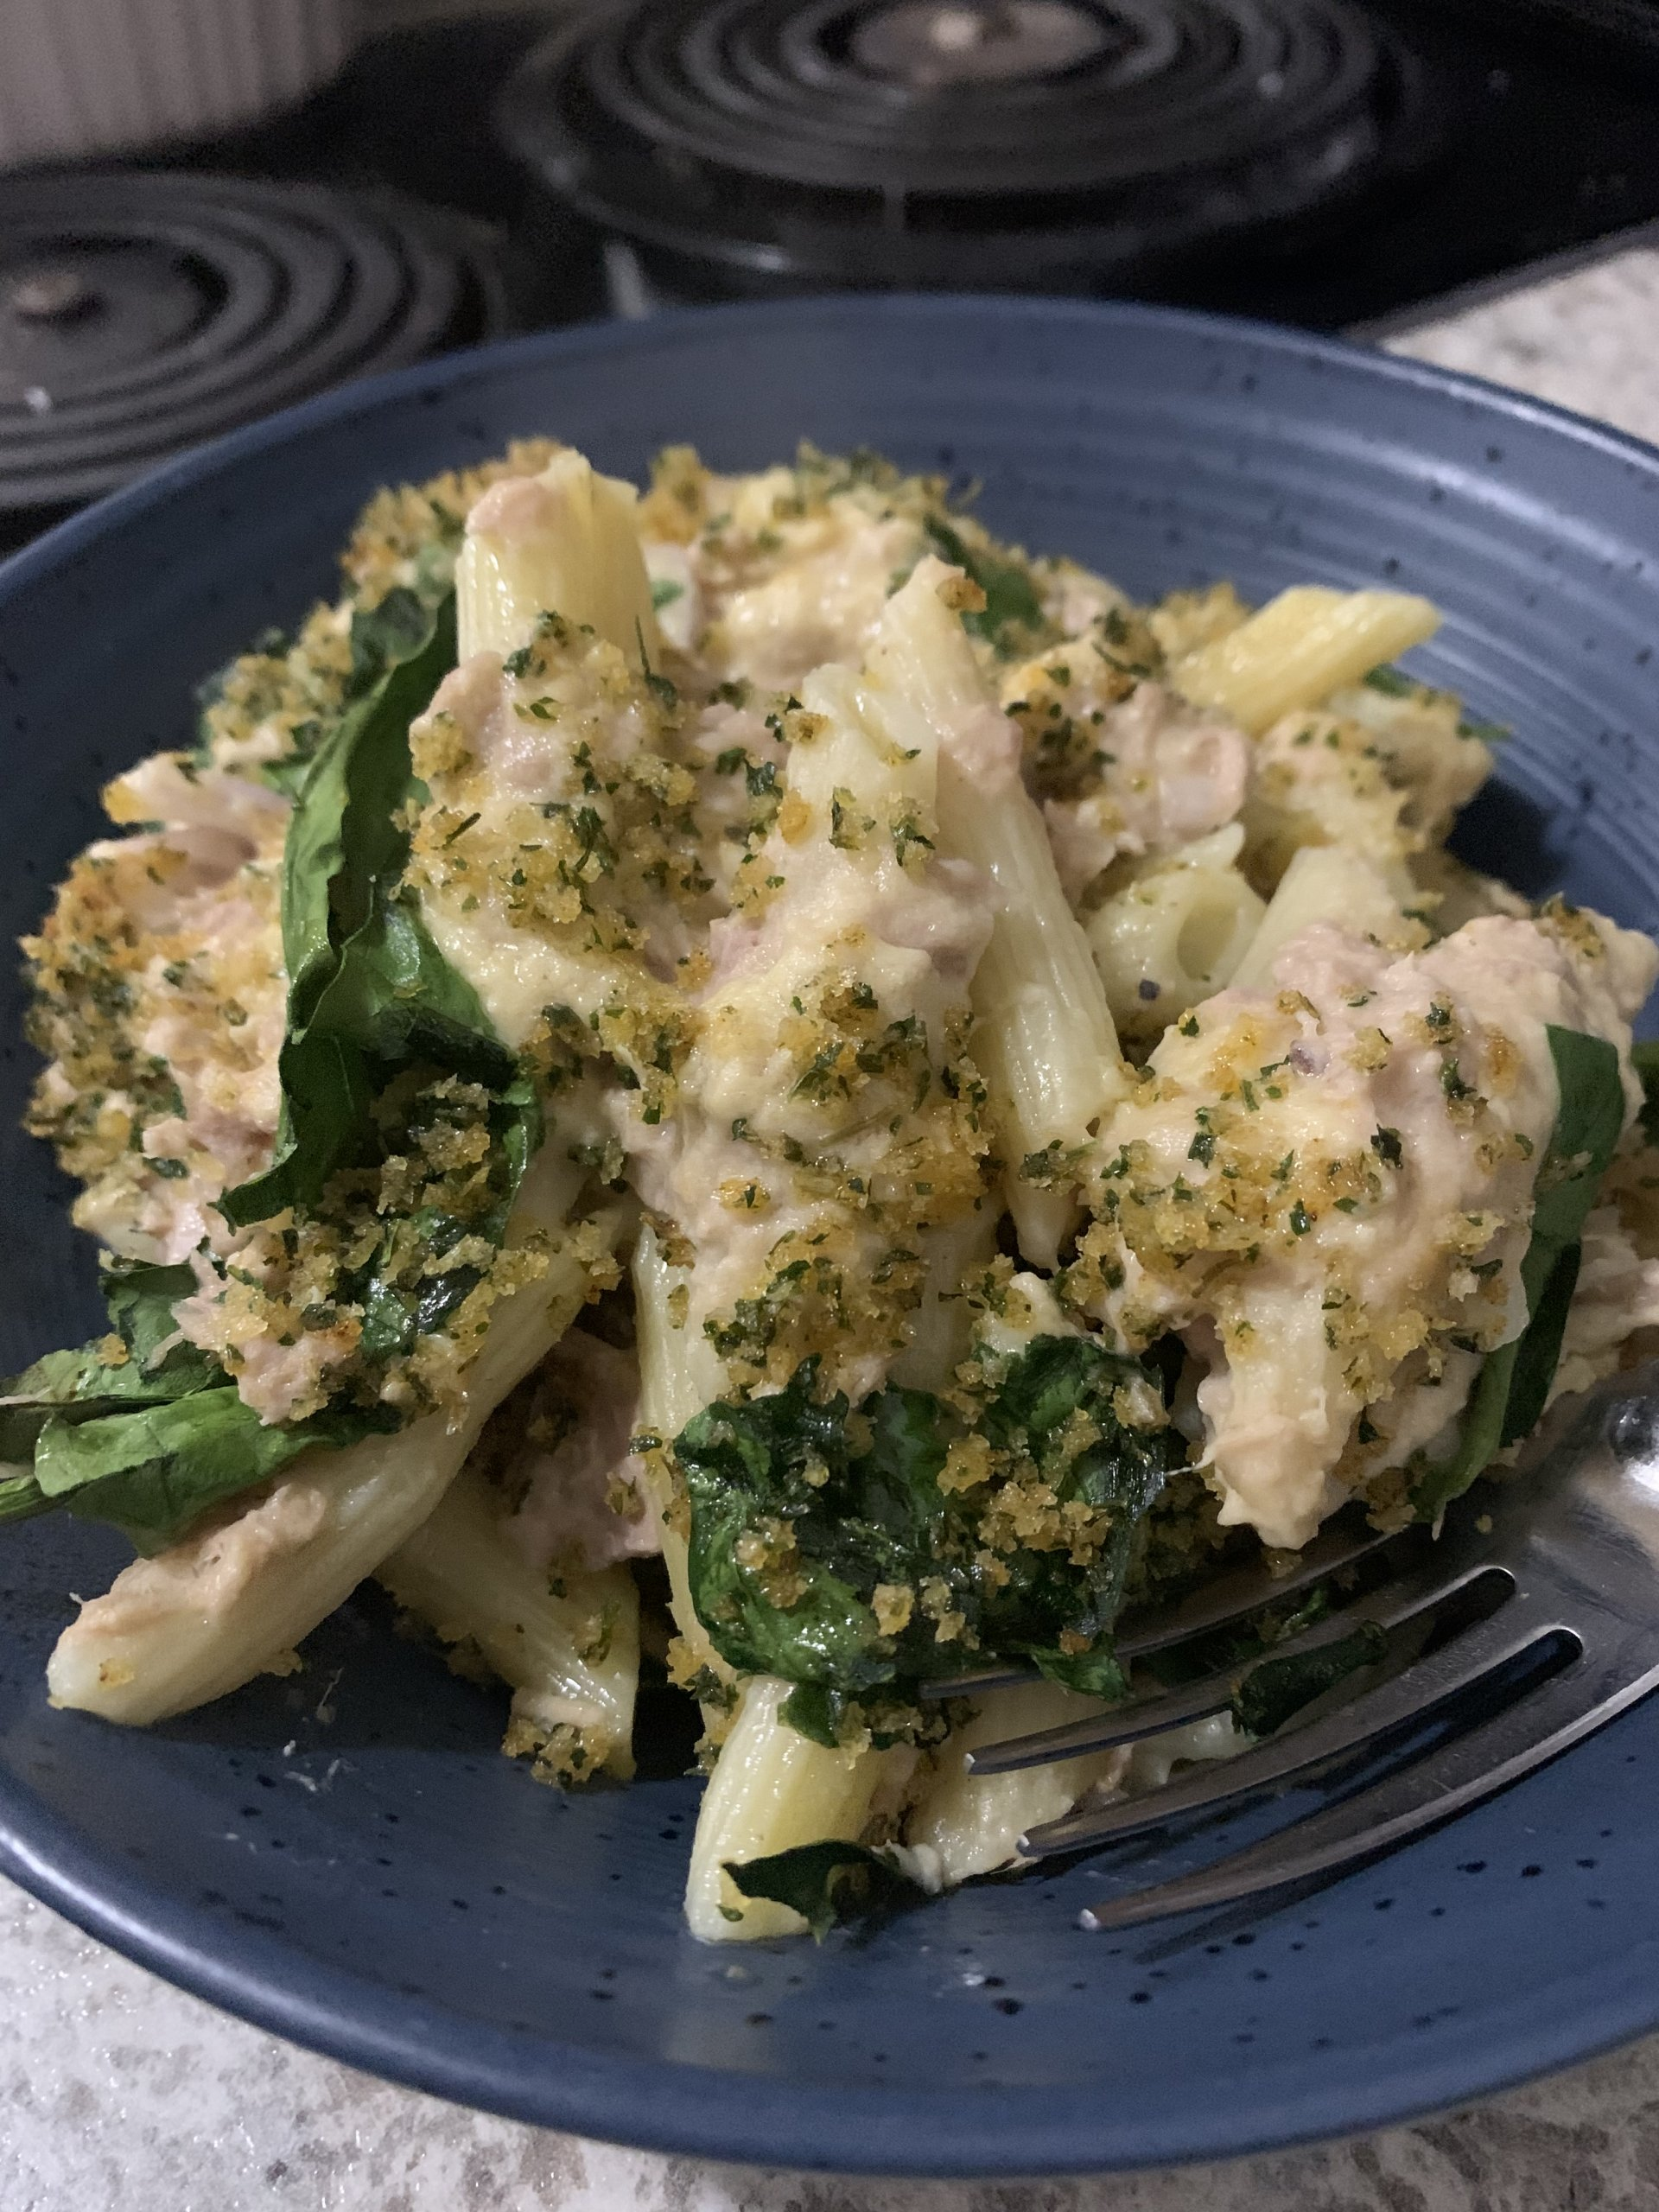 Recipe time: Dairy-free tuna noodle casserole